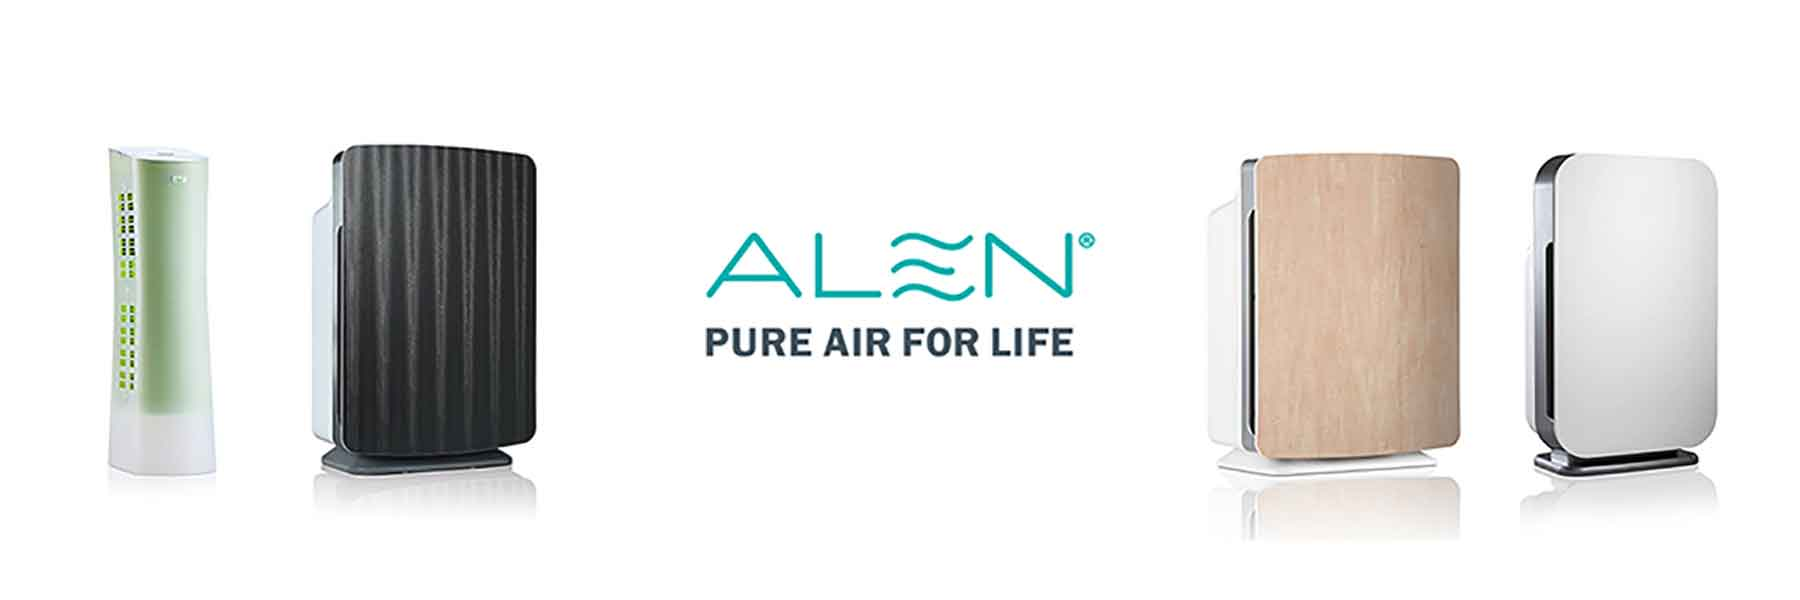 Alen Air Purifiers Review